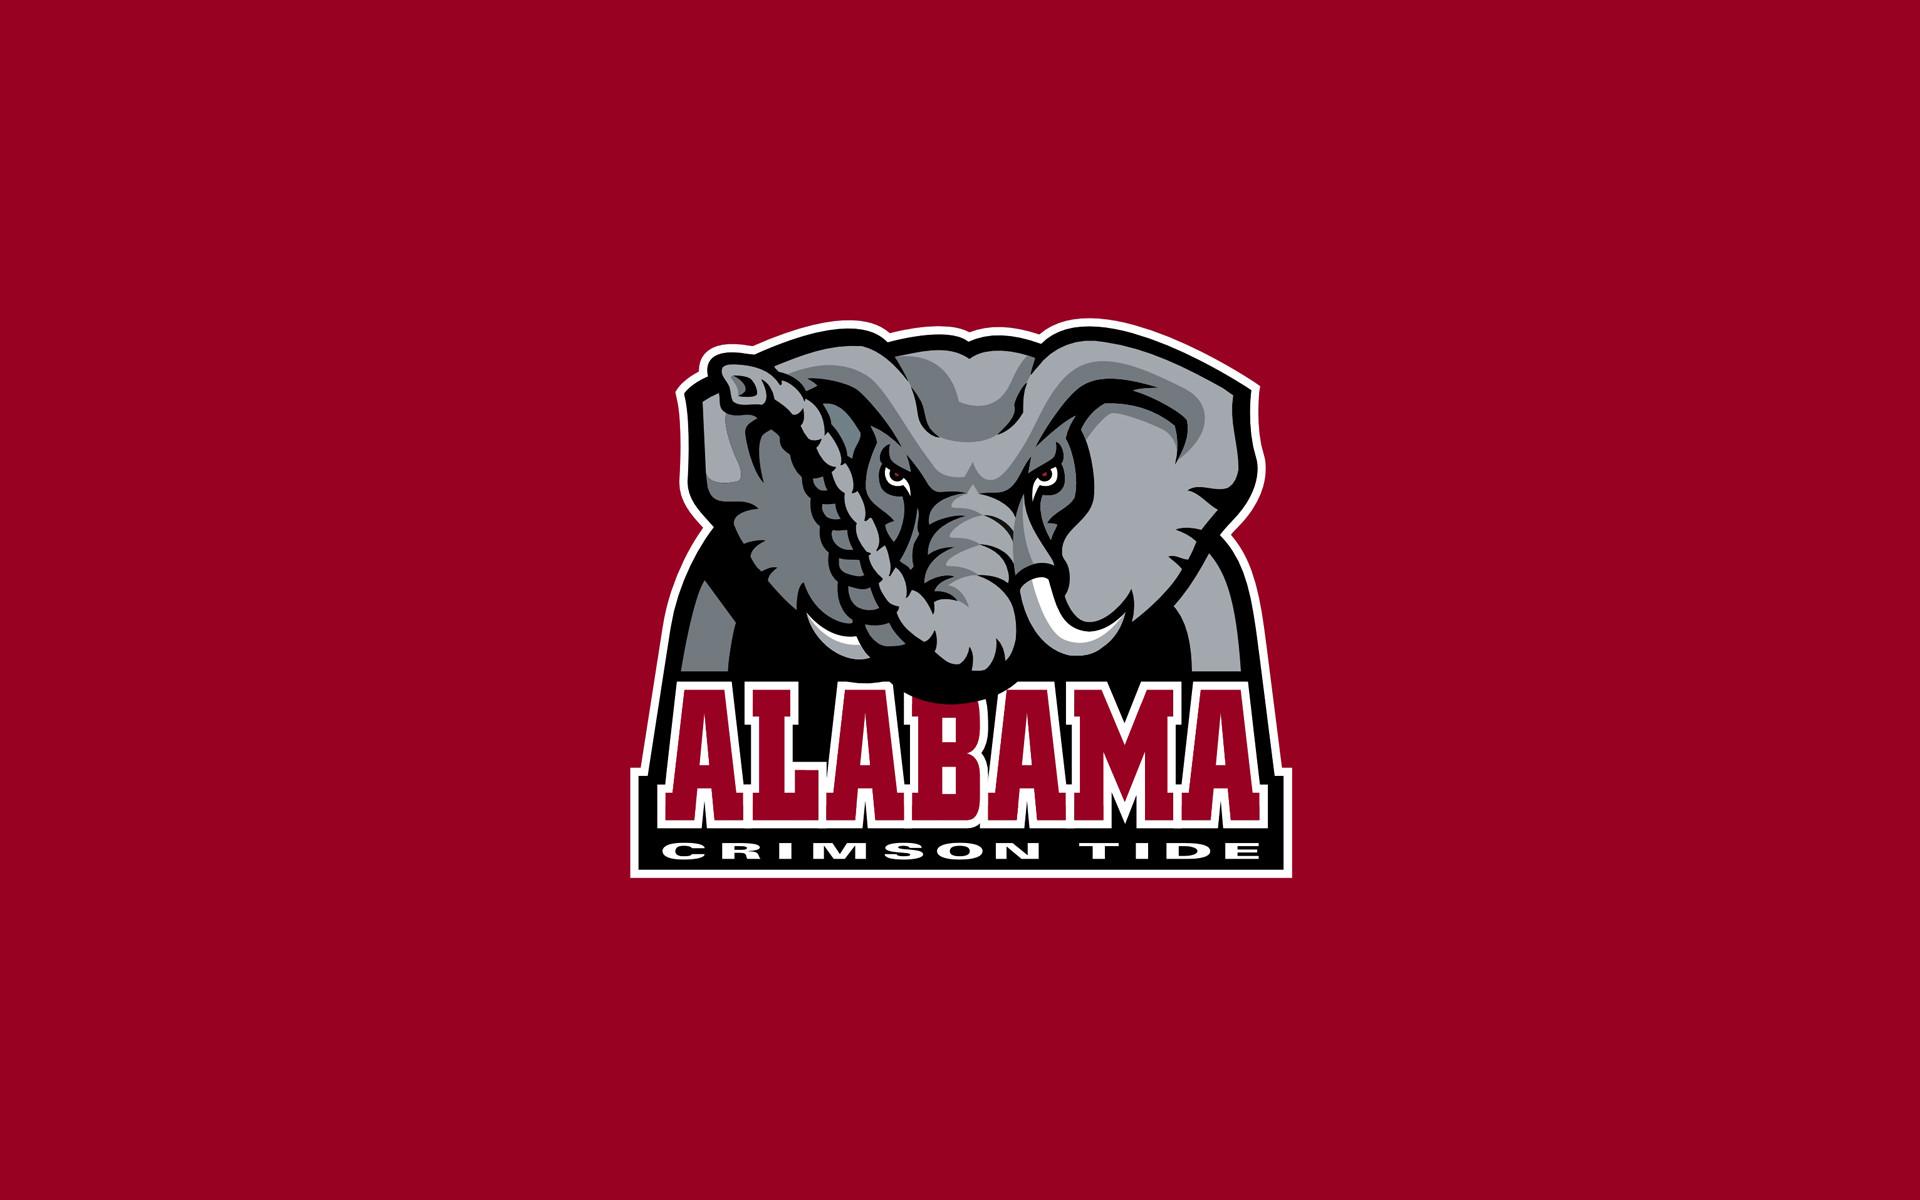 2018 Cool Alabama Football Backgrounds ·① WallpaperTag